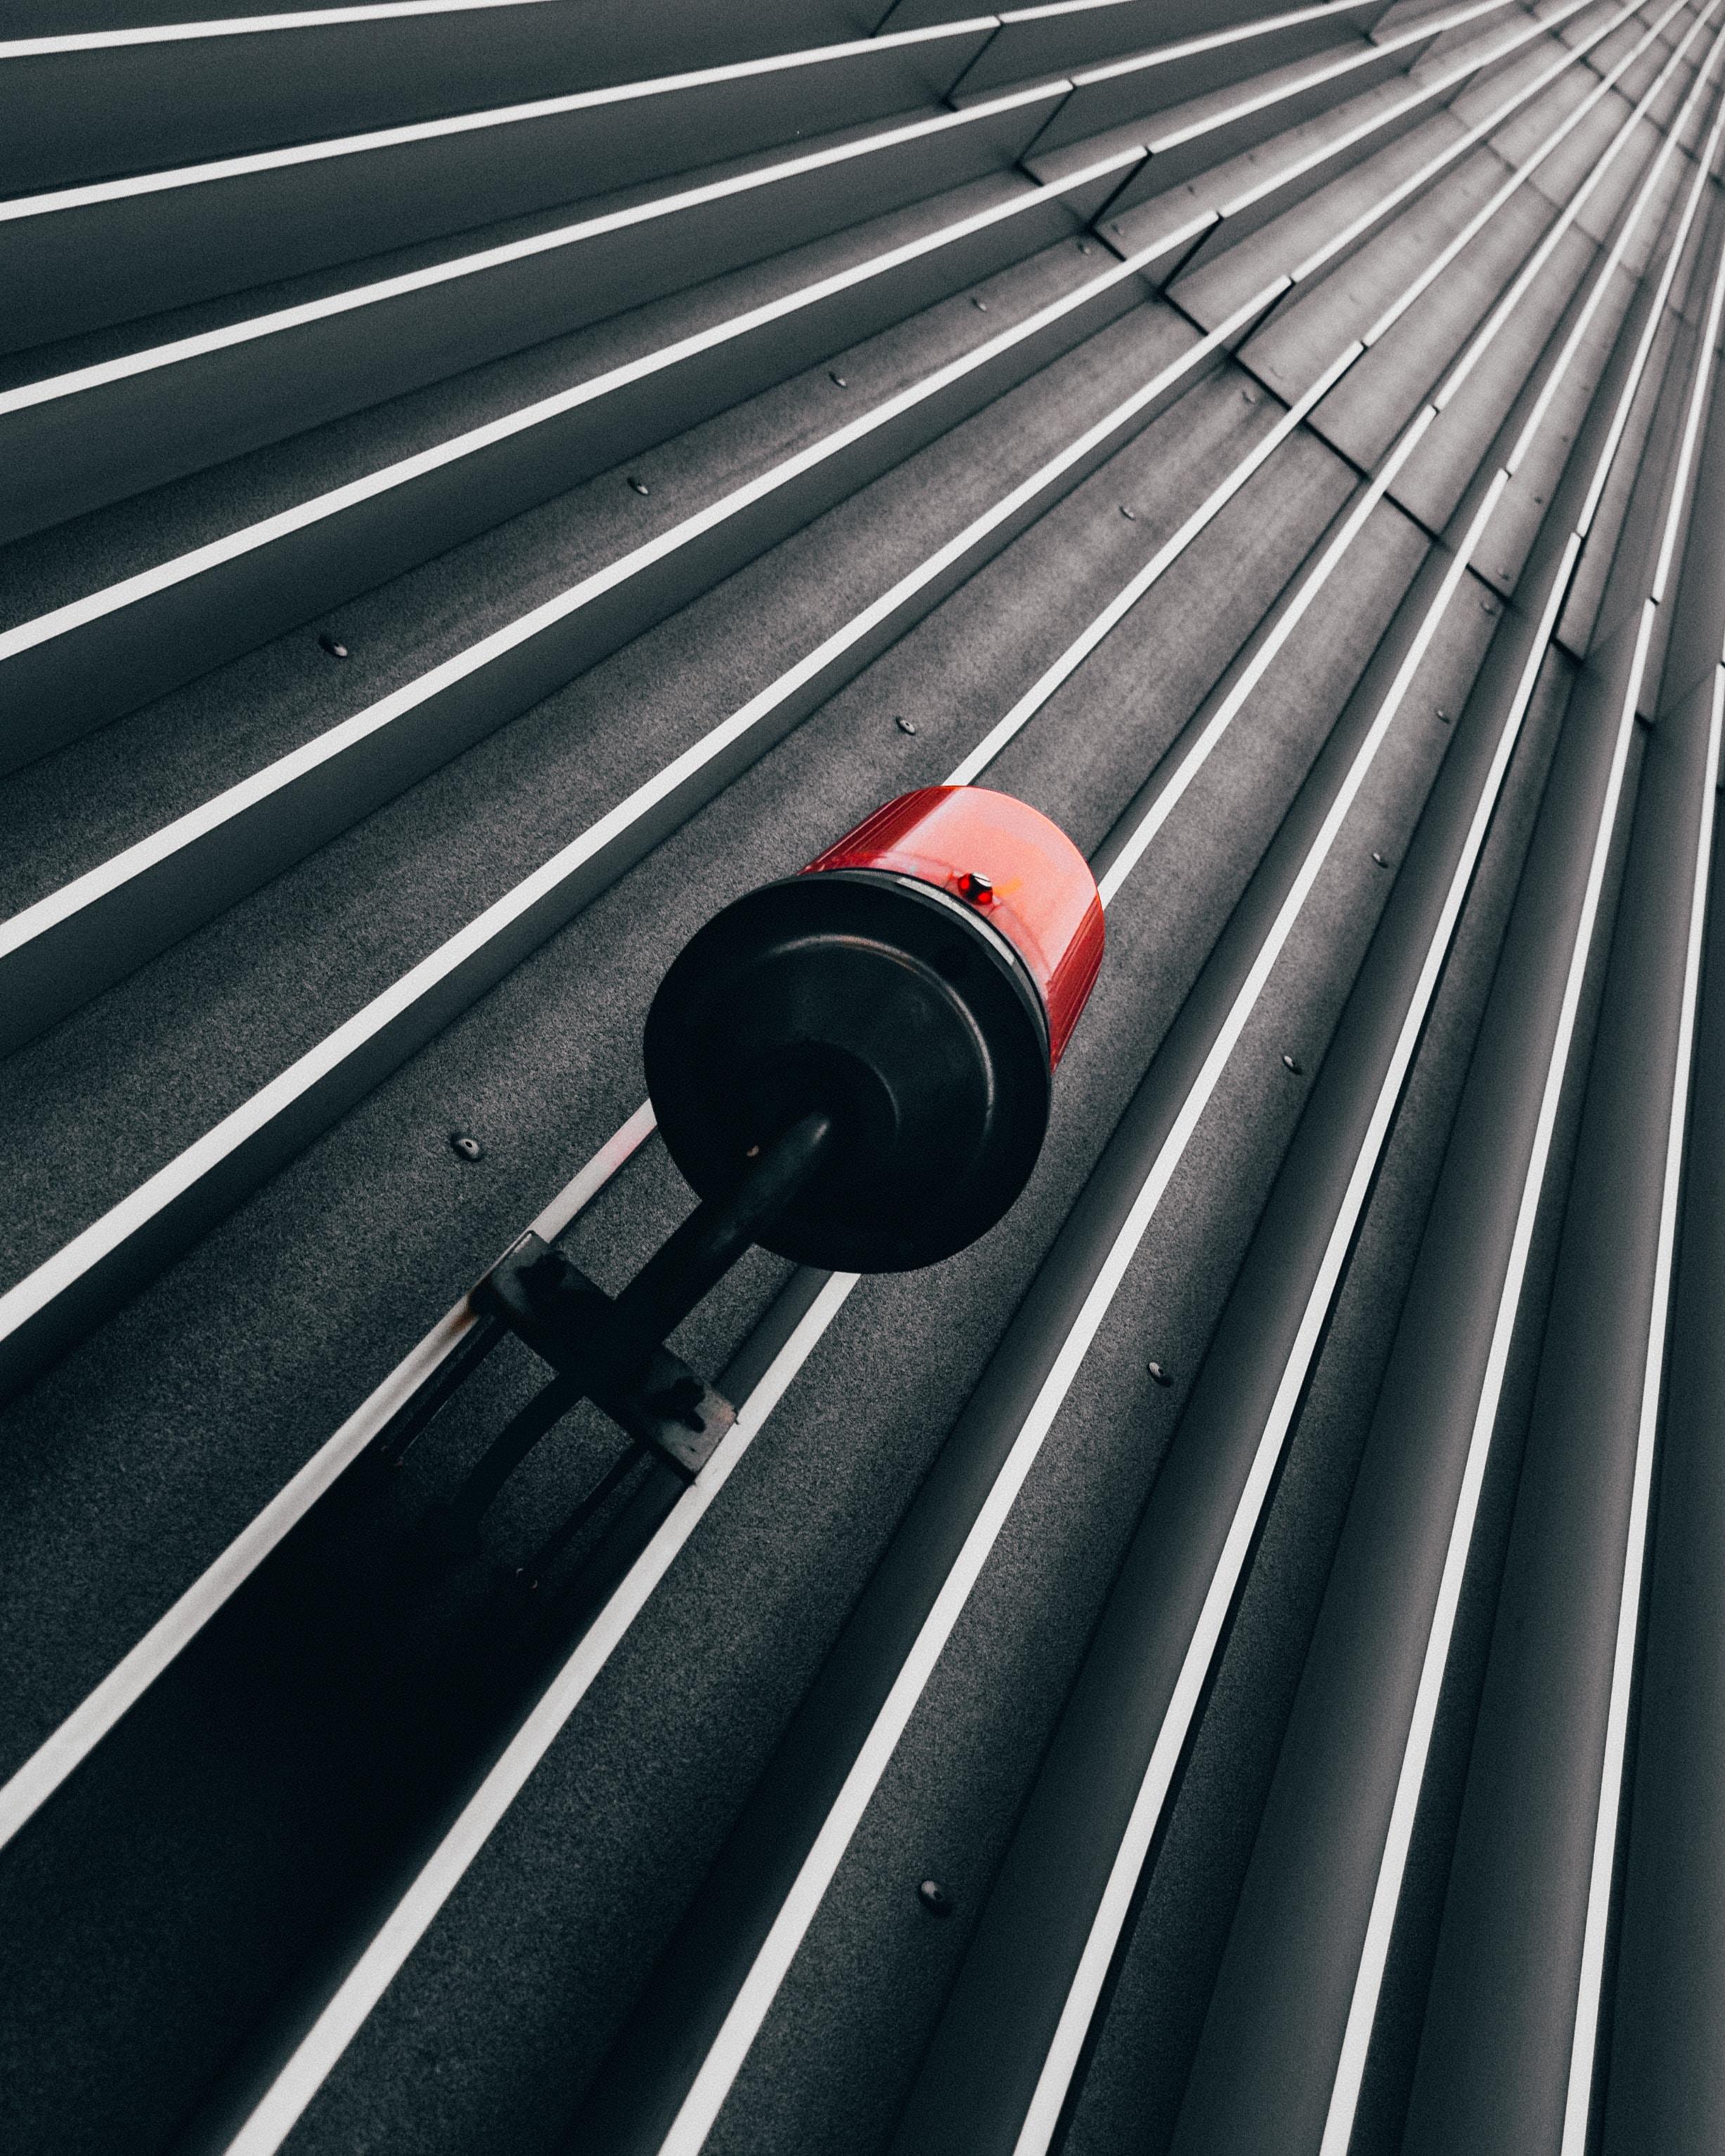 red beacon light